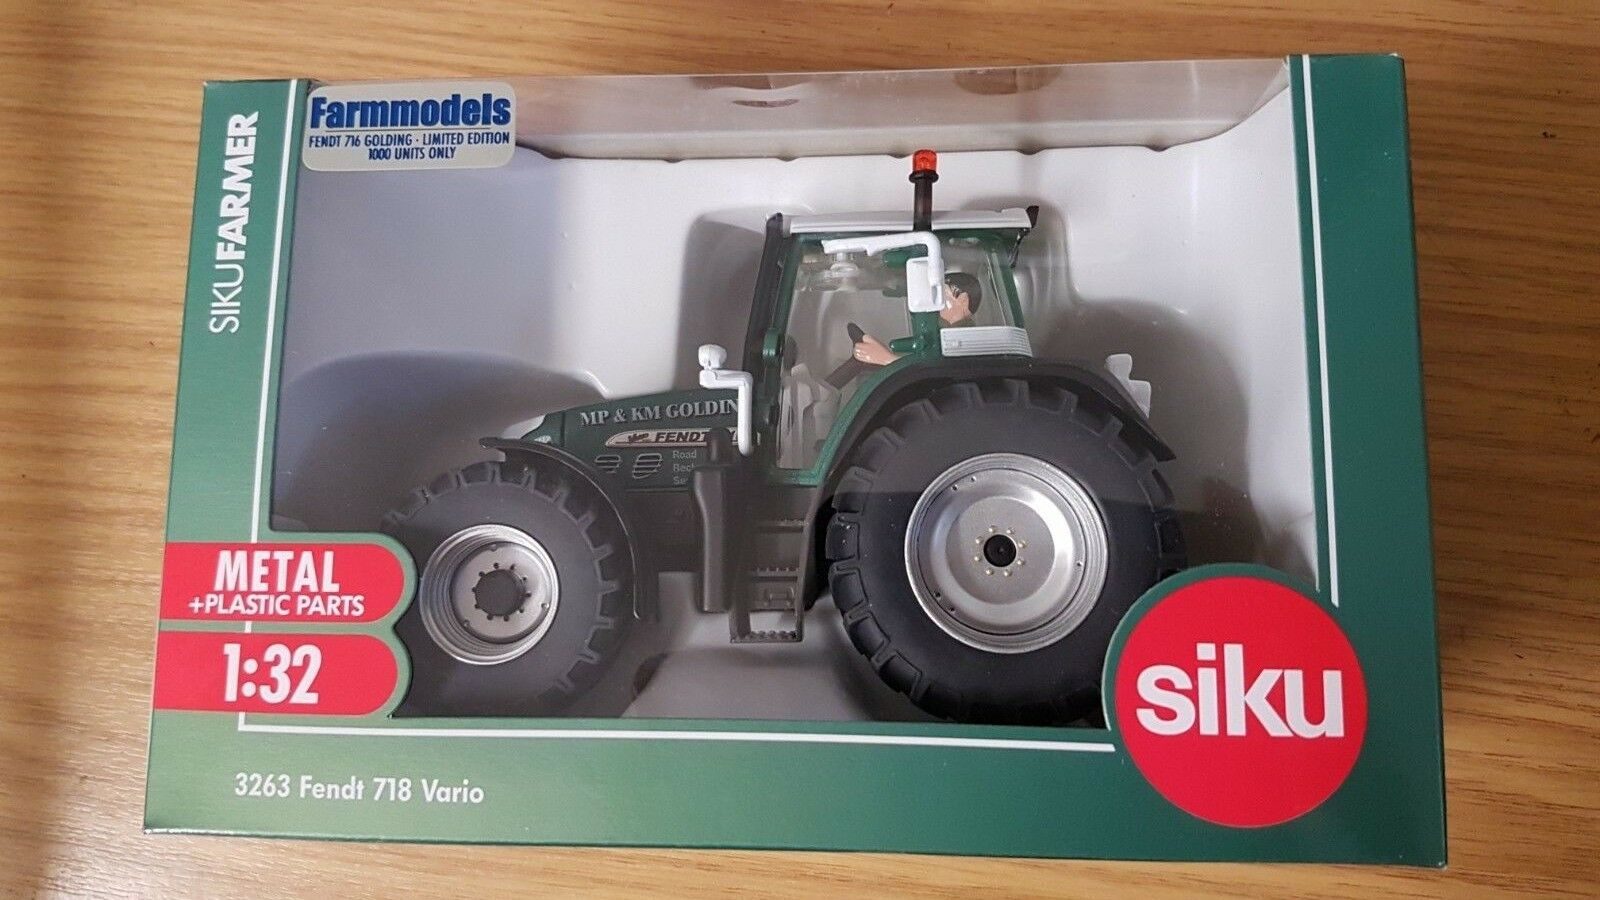 SIKU Modèle Tracteur-oring Limited Edition 1 32